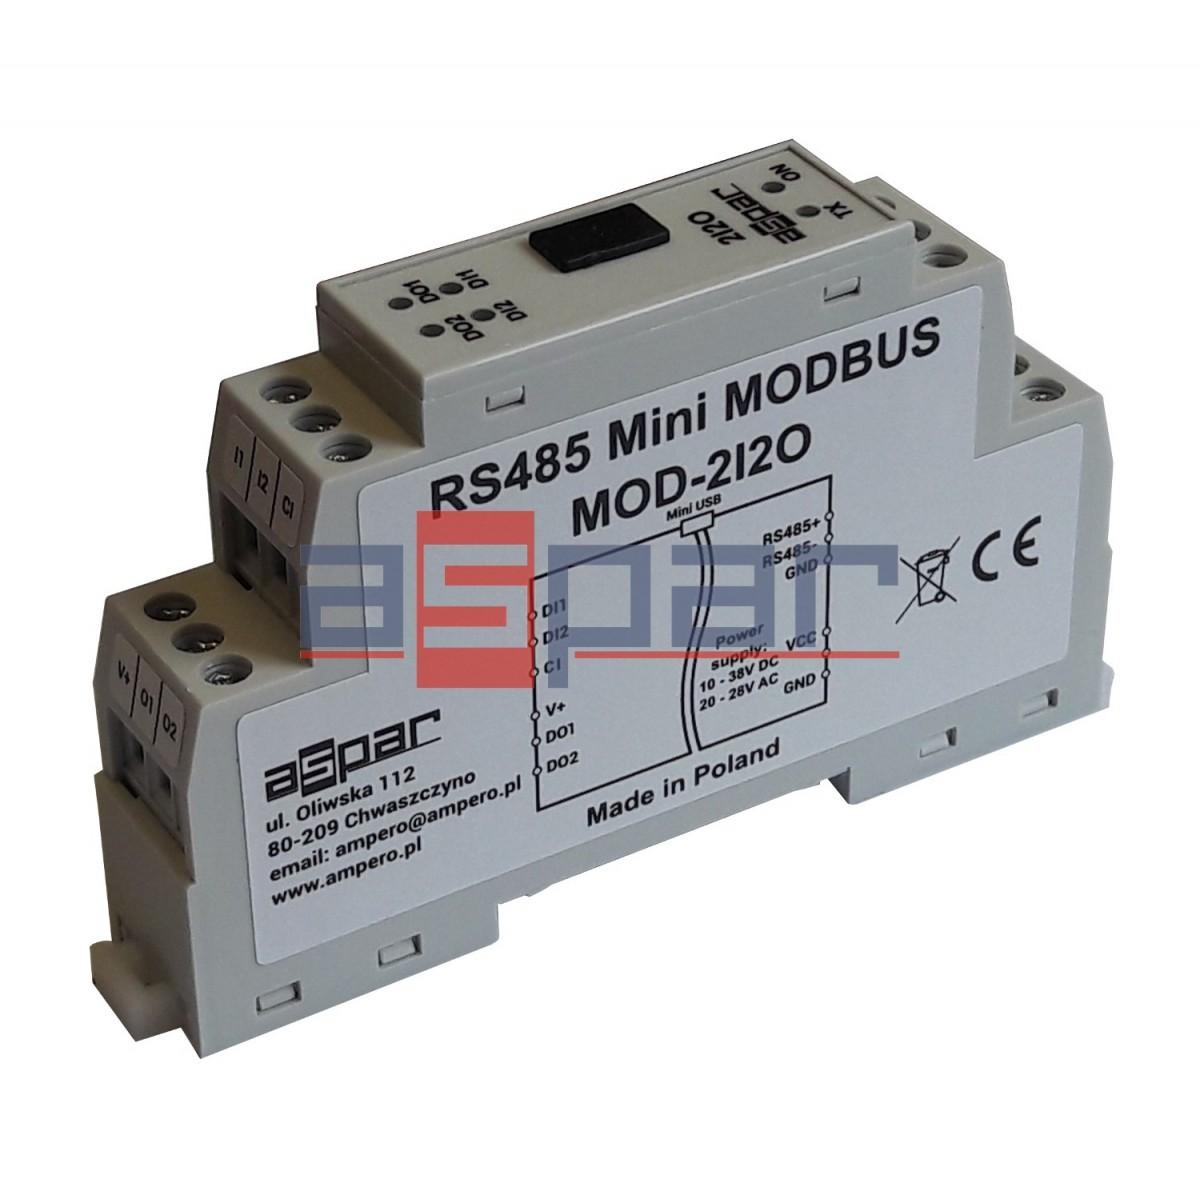 2 digital inputs, 2 digital outputs MOD-2I2O